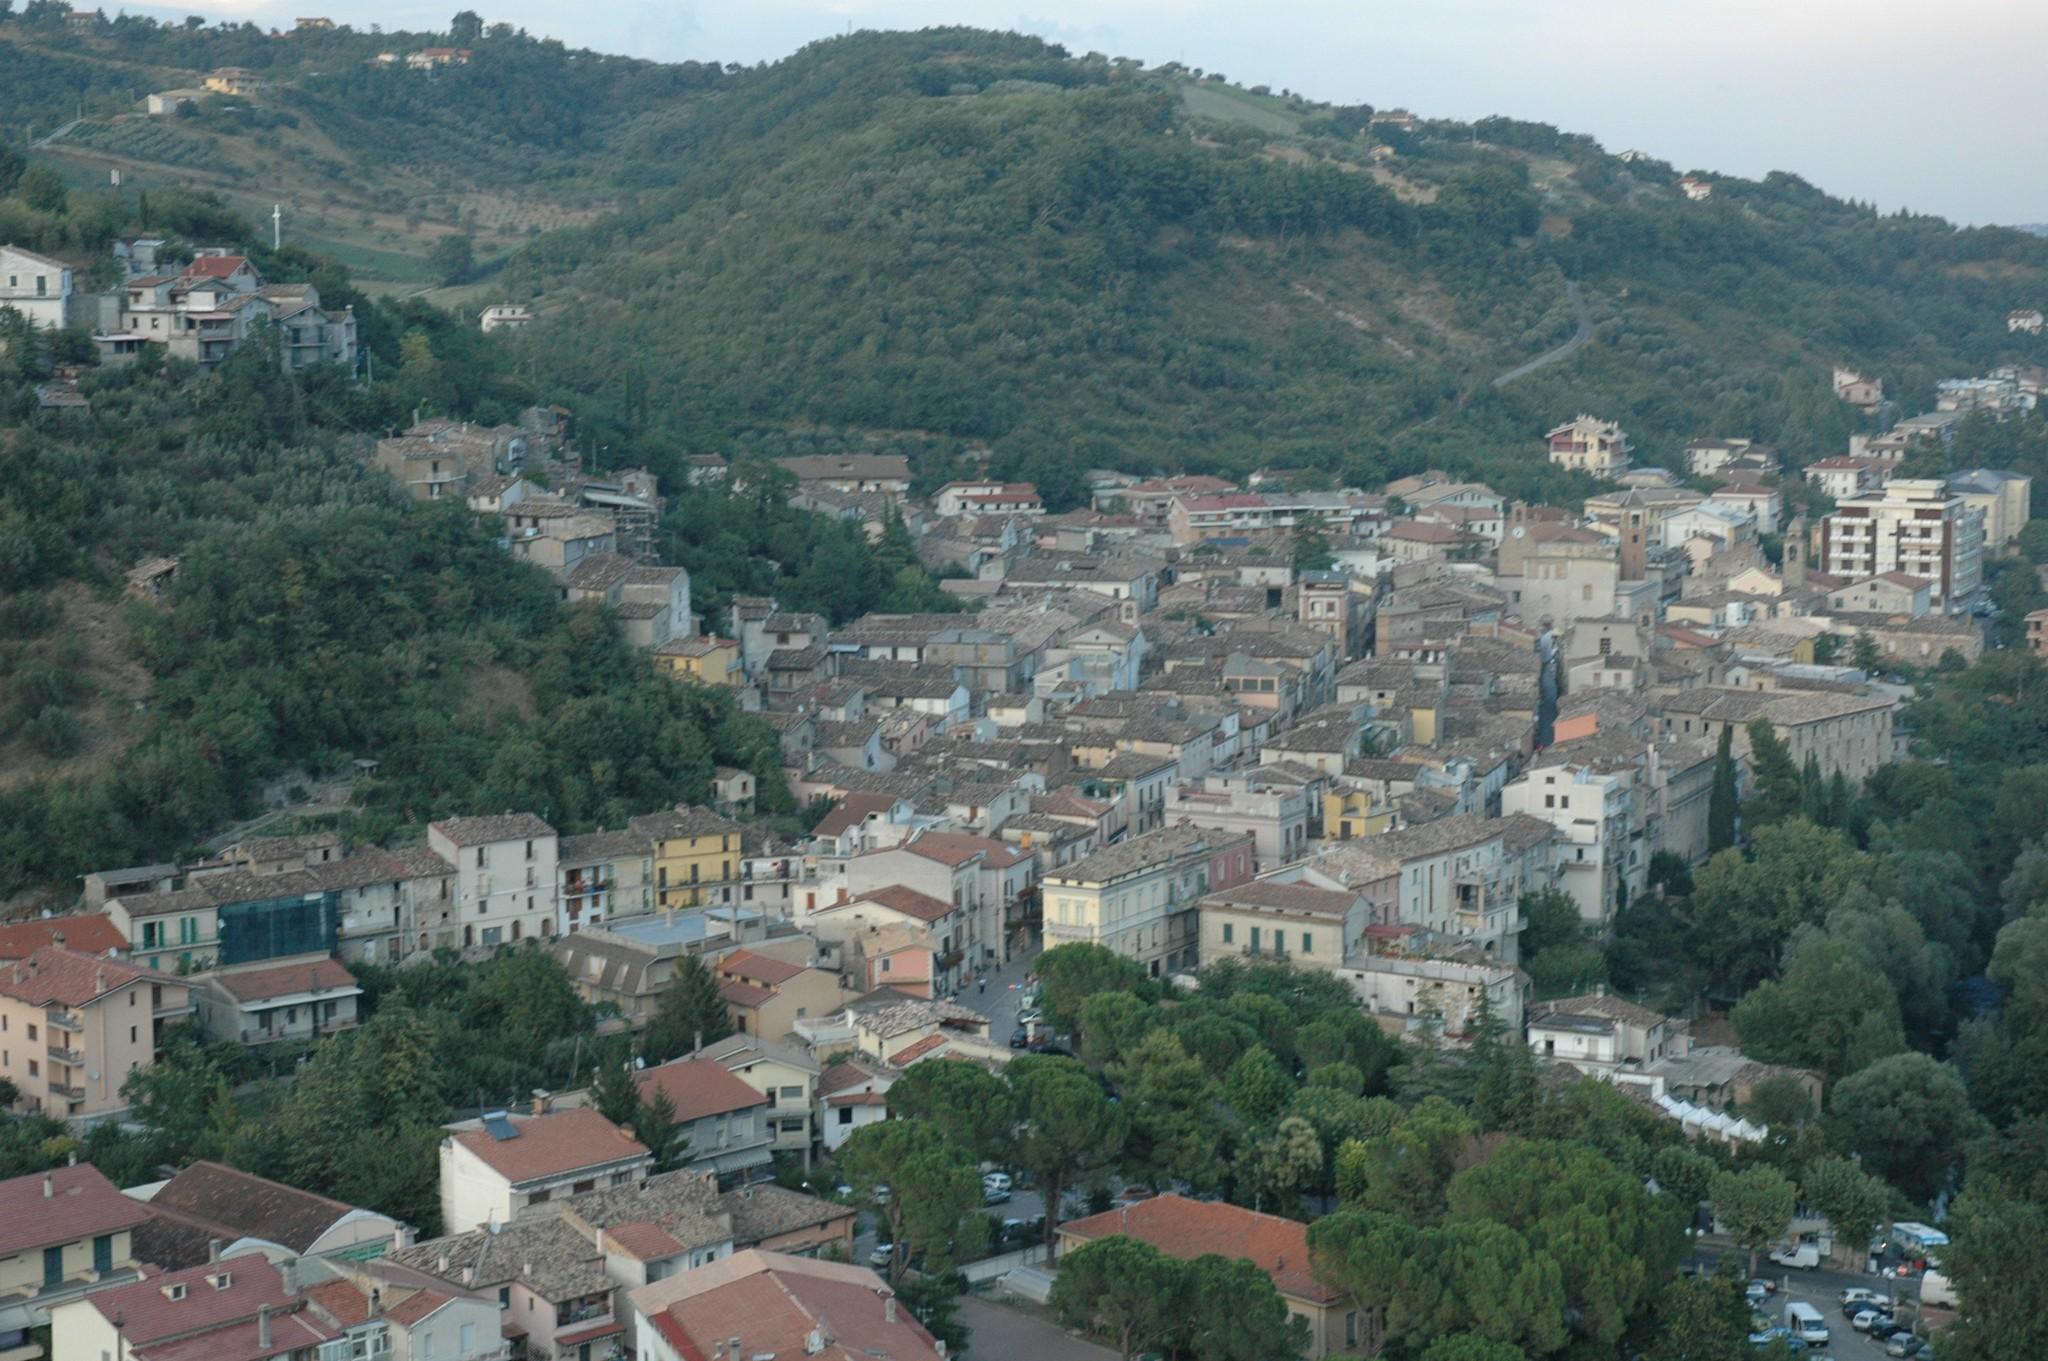 Terremoto centro italia case evacuate a montorio al vomano - Piscina montorio al vomano ...